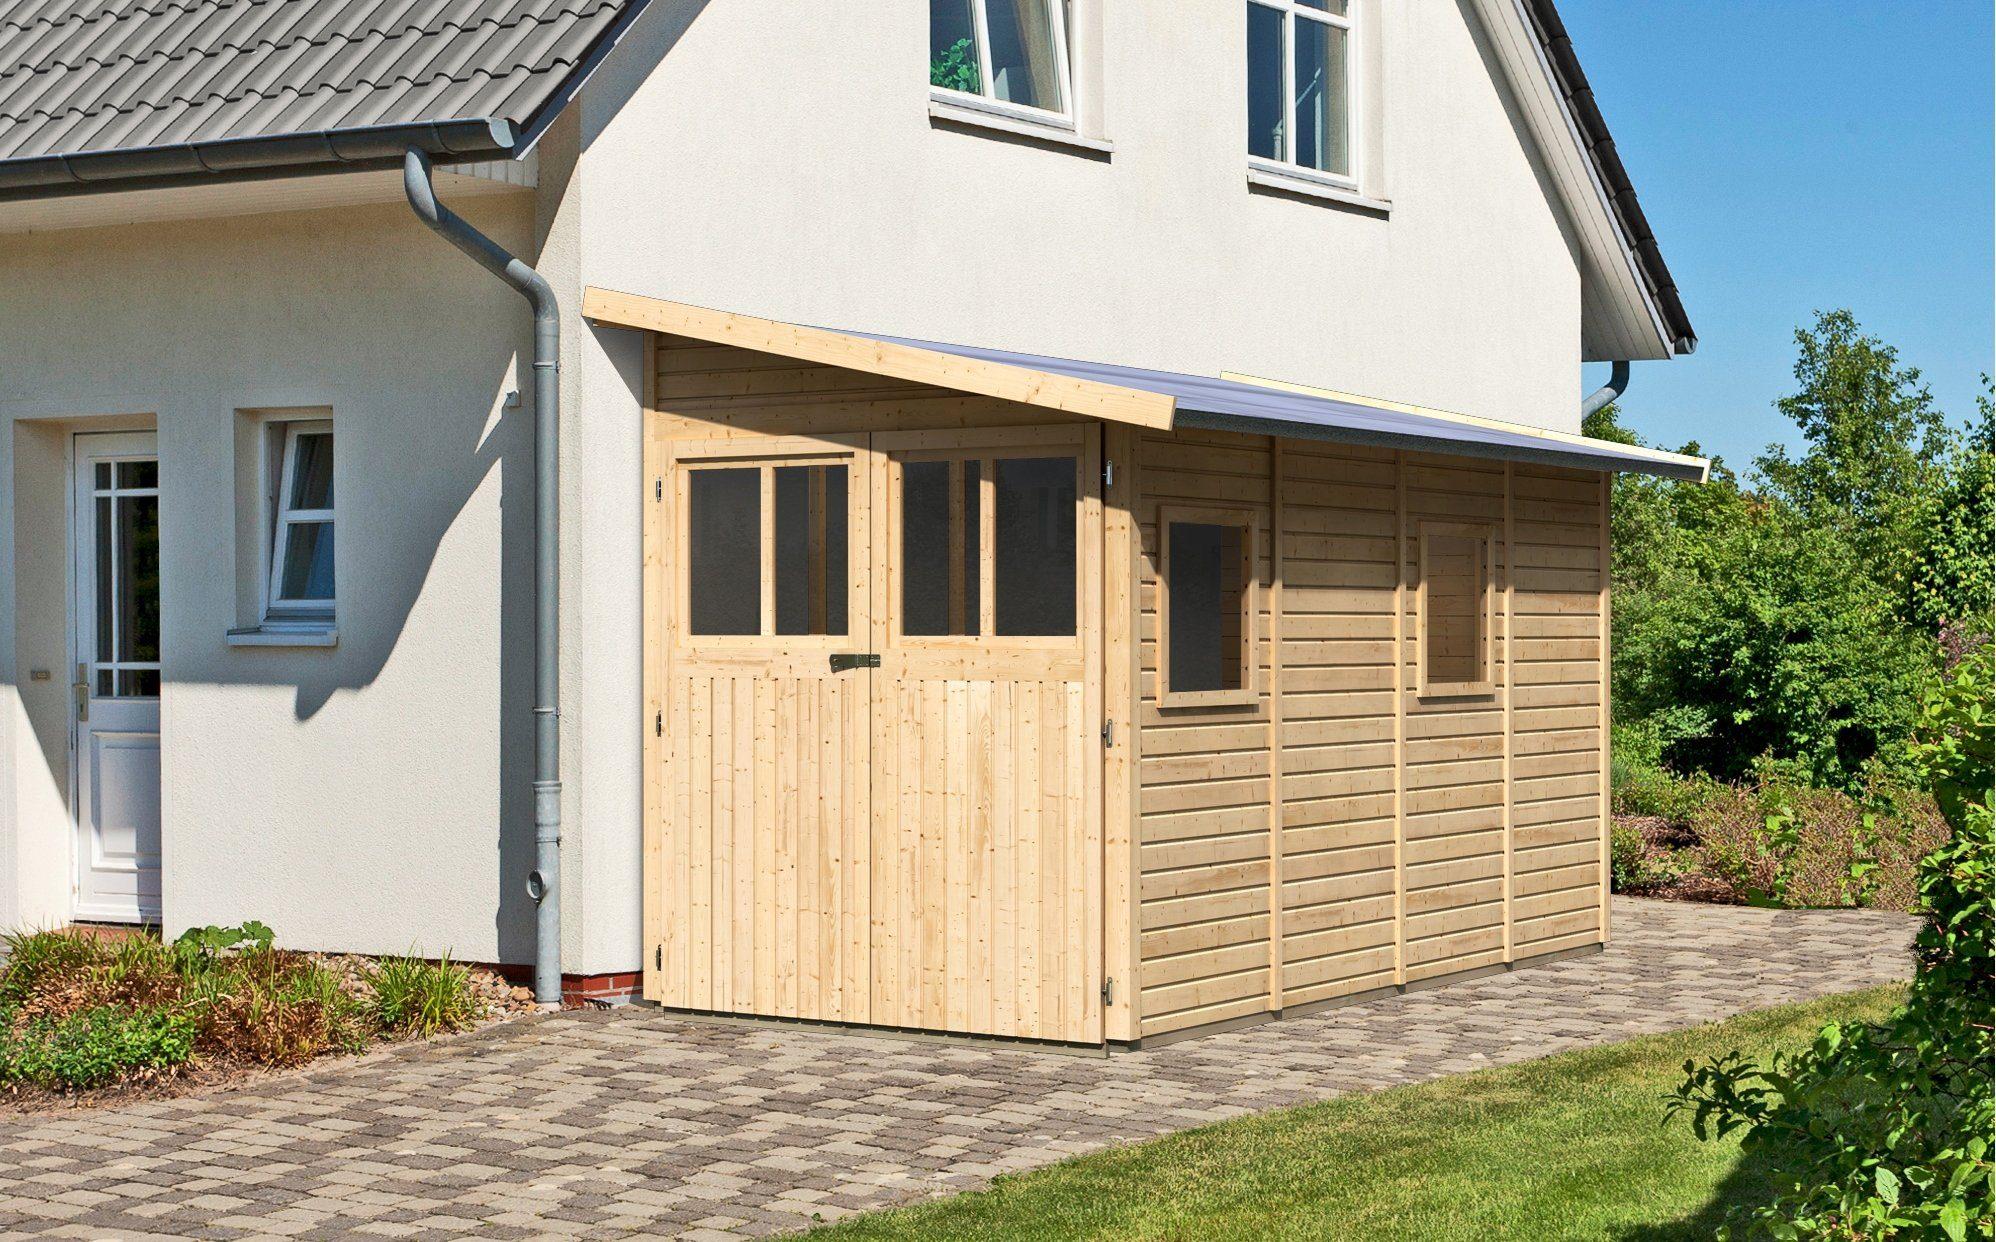 KARIBU Gartenhaus »Wittenburg 4«, BxT: 200x408 cm